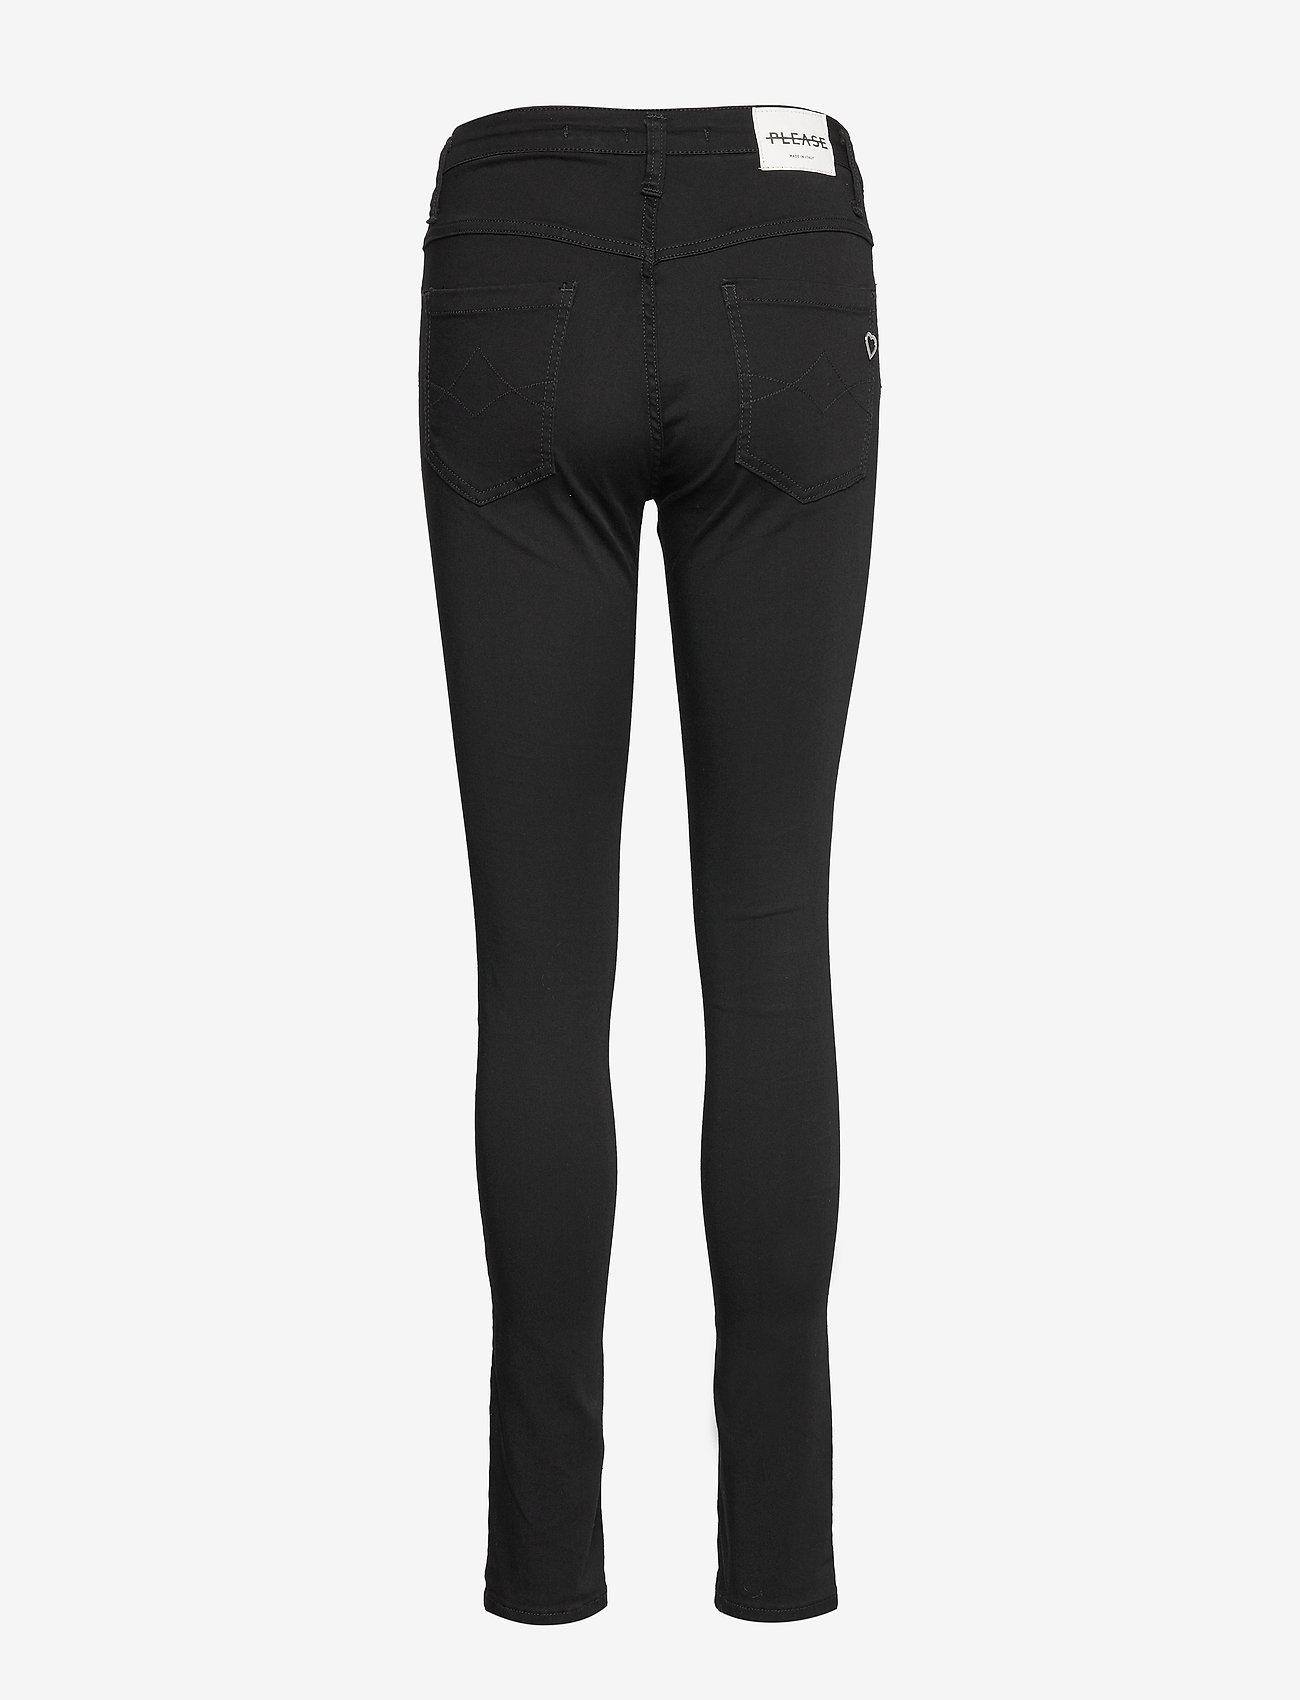 Please Jeans - SLENDER SILK TOUCH - slim fit bukser - 9000 nero - 1